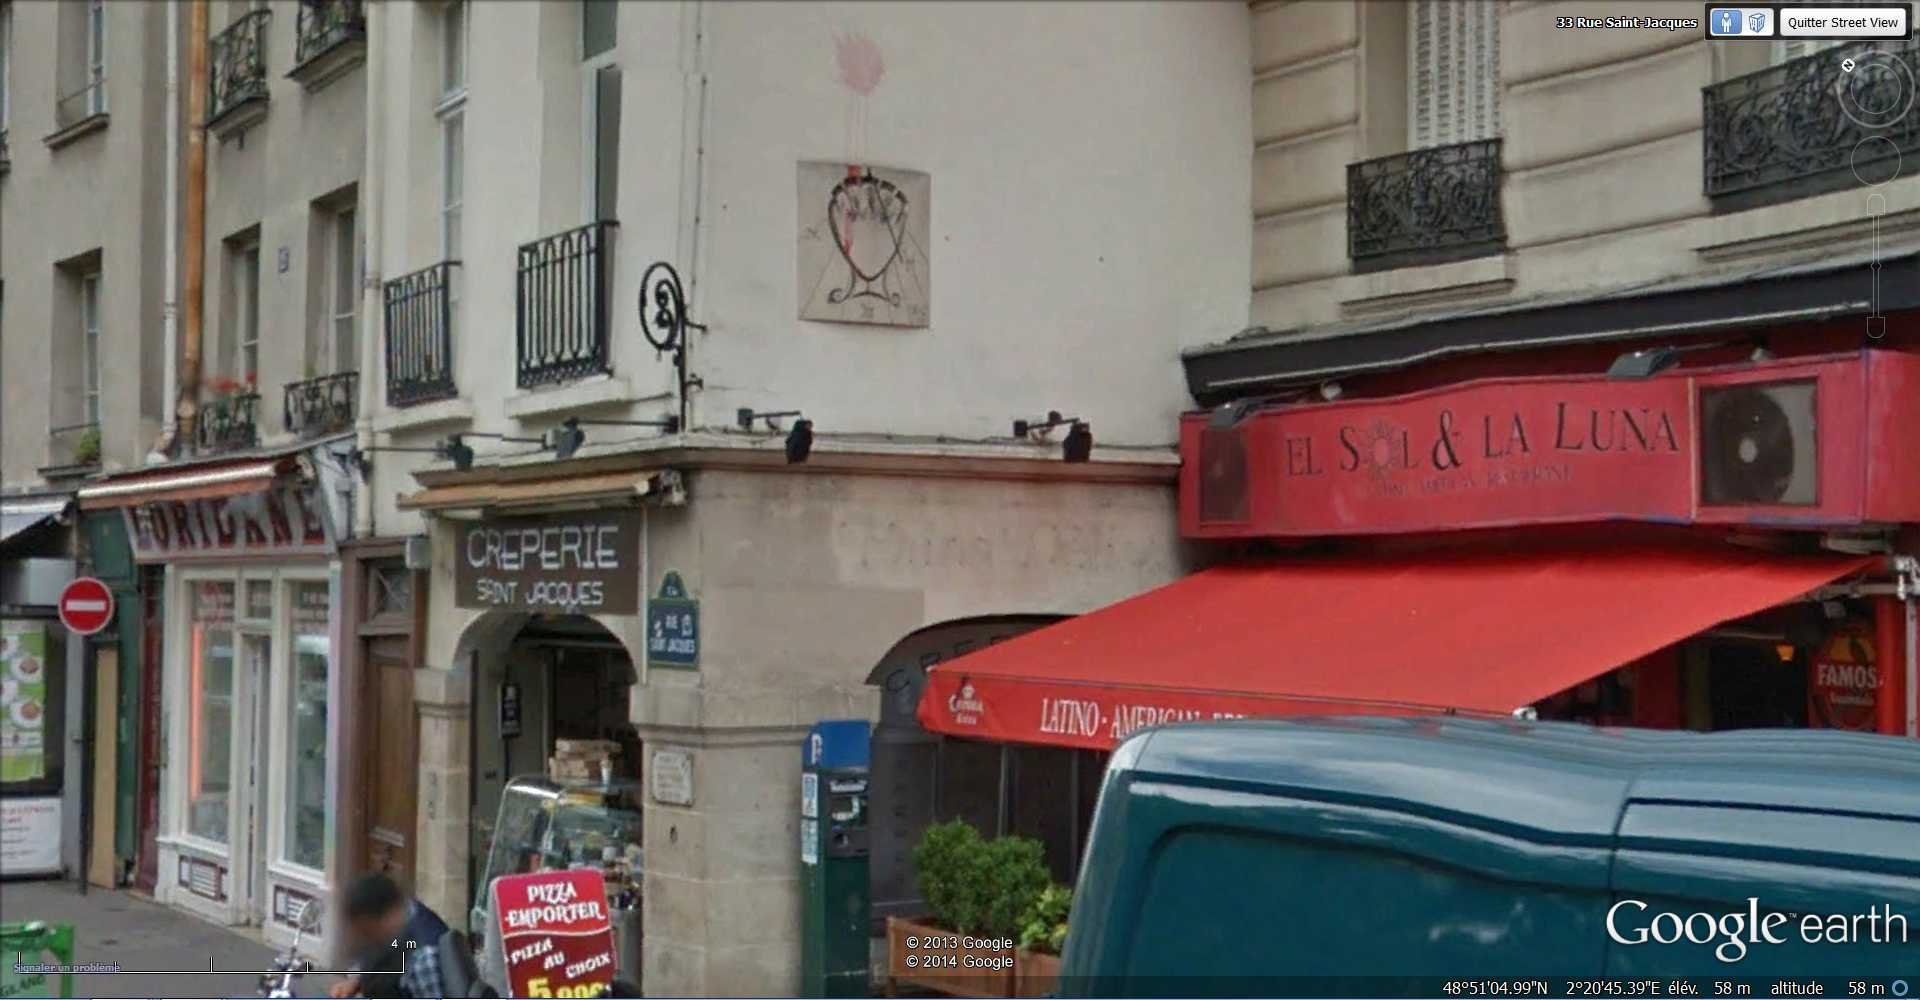 STREET VIEW: Les cadrans solaires en façade. 2014-053